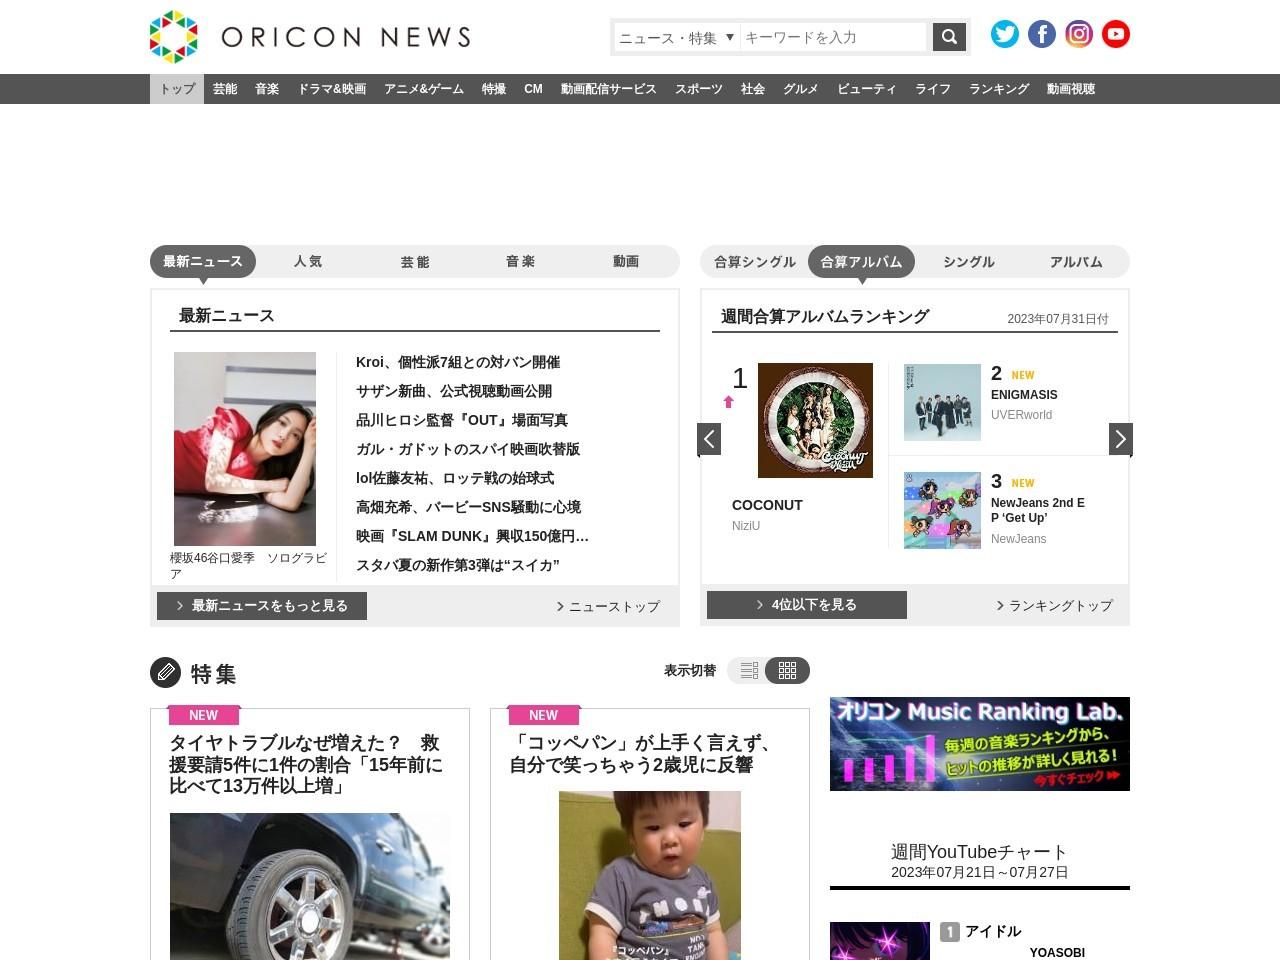 【LINE MUSICランキング】E-girls初のバラードが1位に初登場